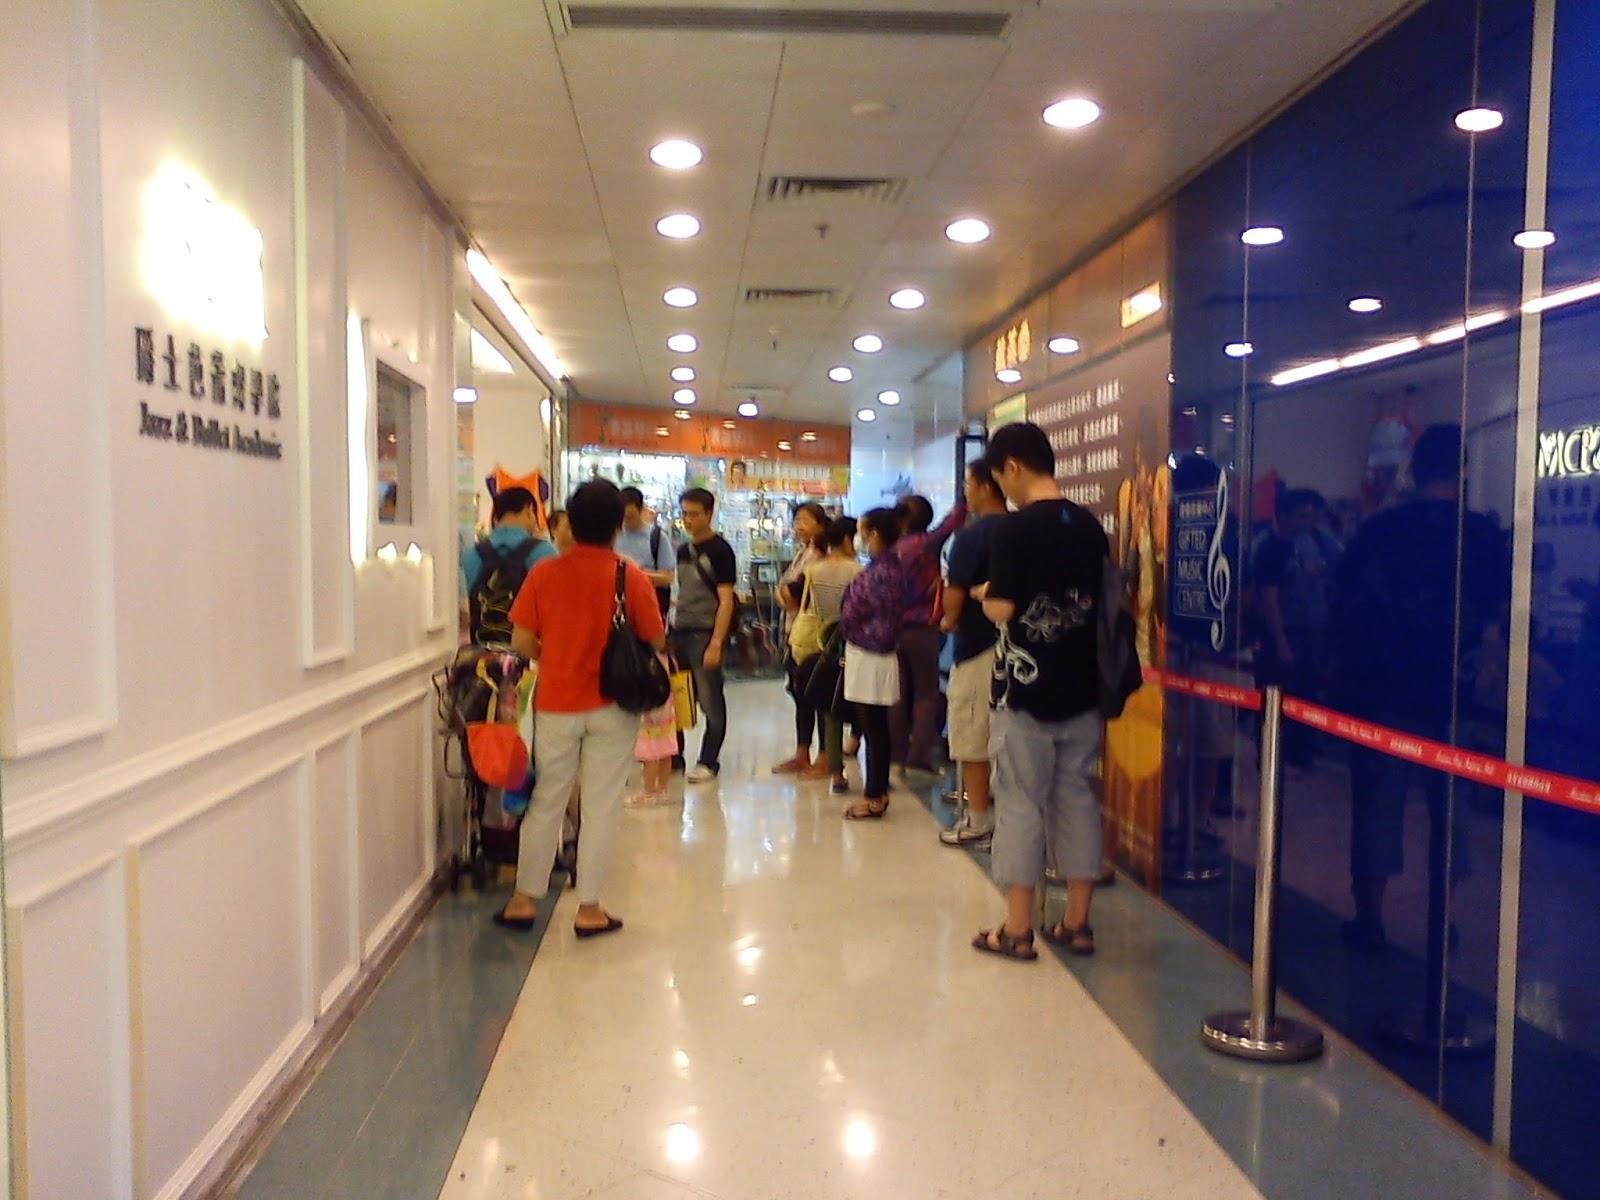 Grassroots O2: 巡視業務.領匯.海悅豪園購物商場 @2013-06-15